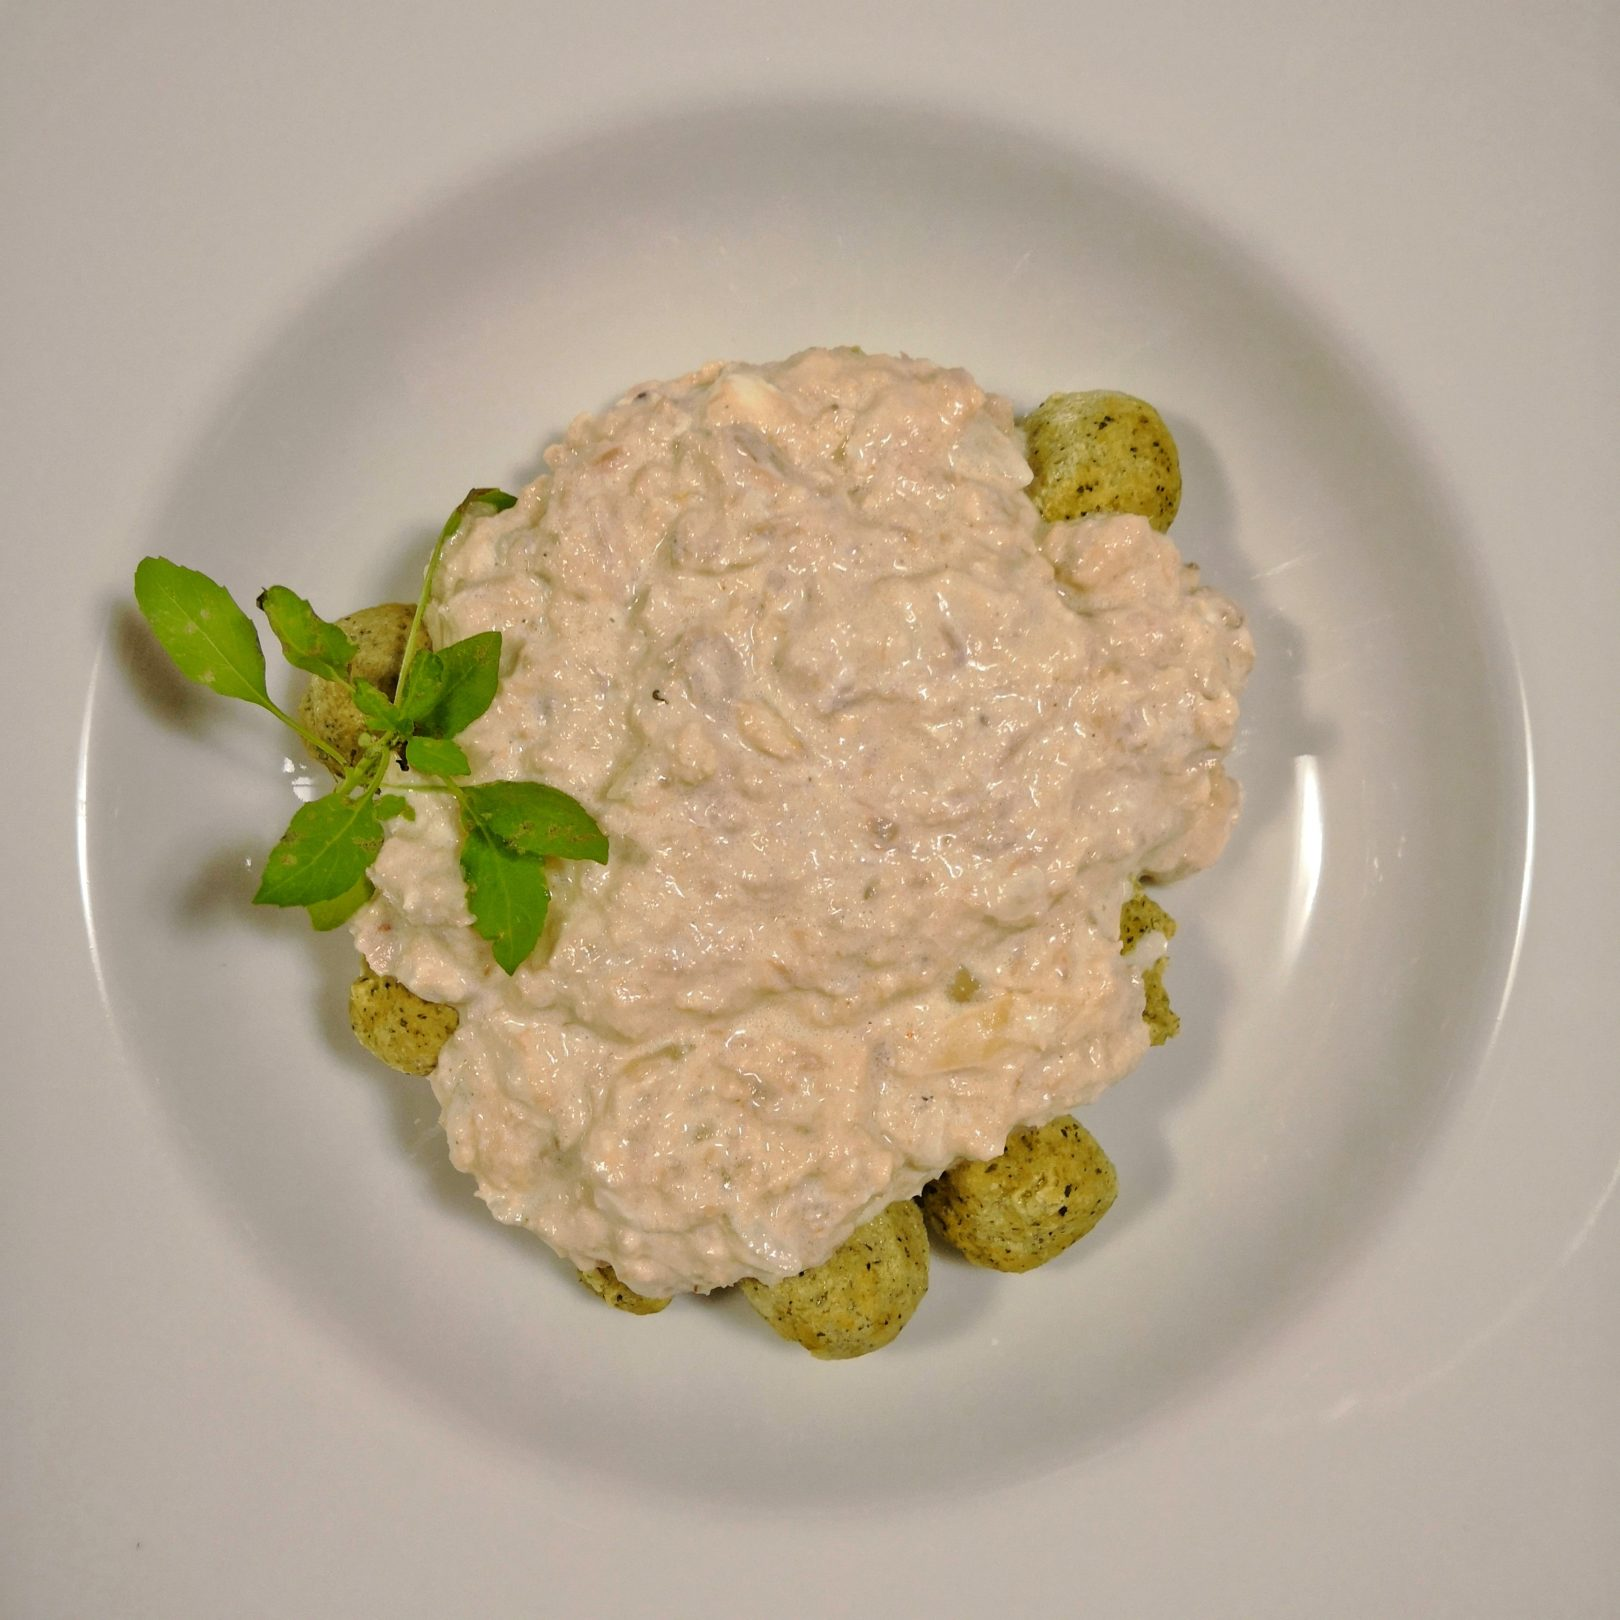 Low-Carb Gnocchi al Tonno (Gnocchi with Tuna Sauce)